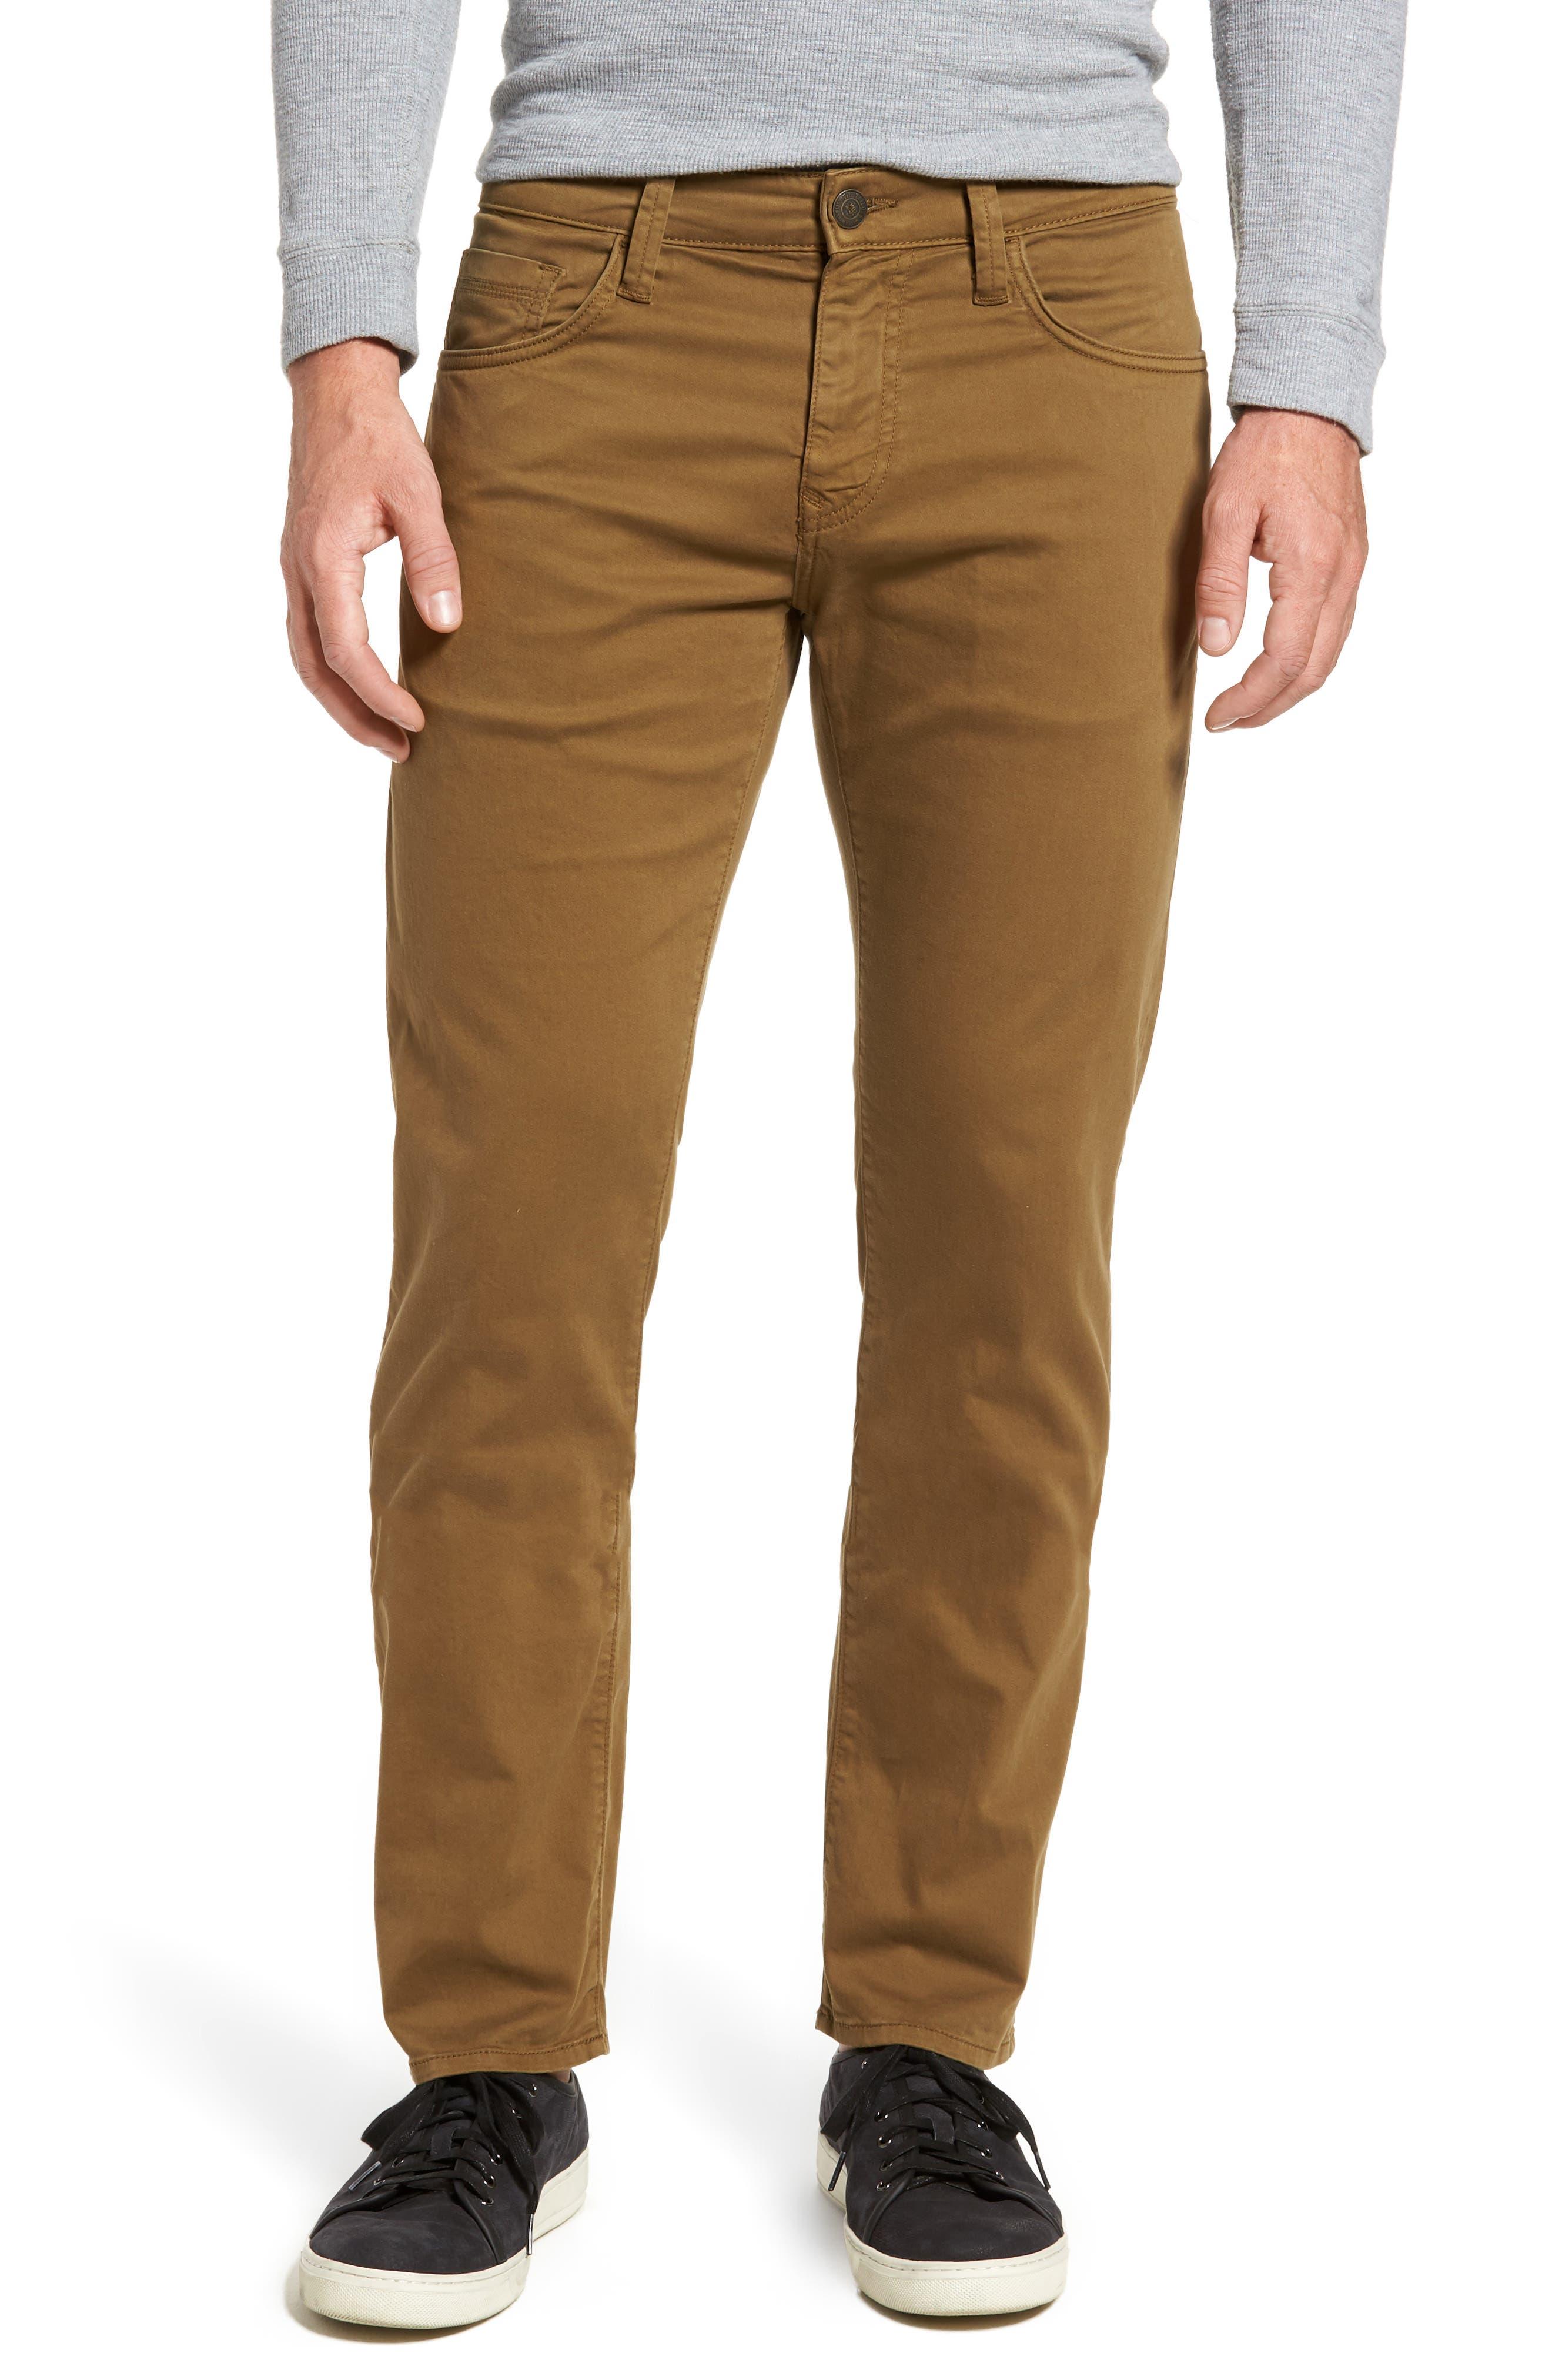 Alternate Image 1 Selected - Mavi Jeans Zach Straight Leg Twill Pants